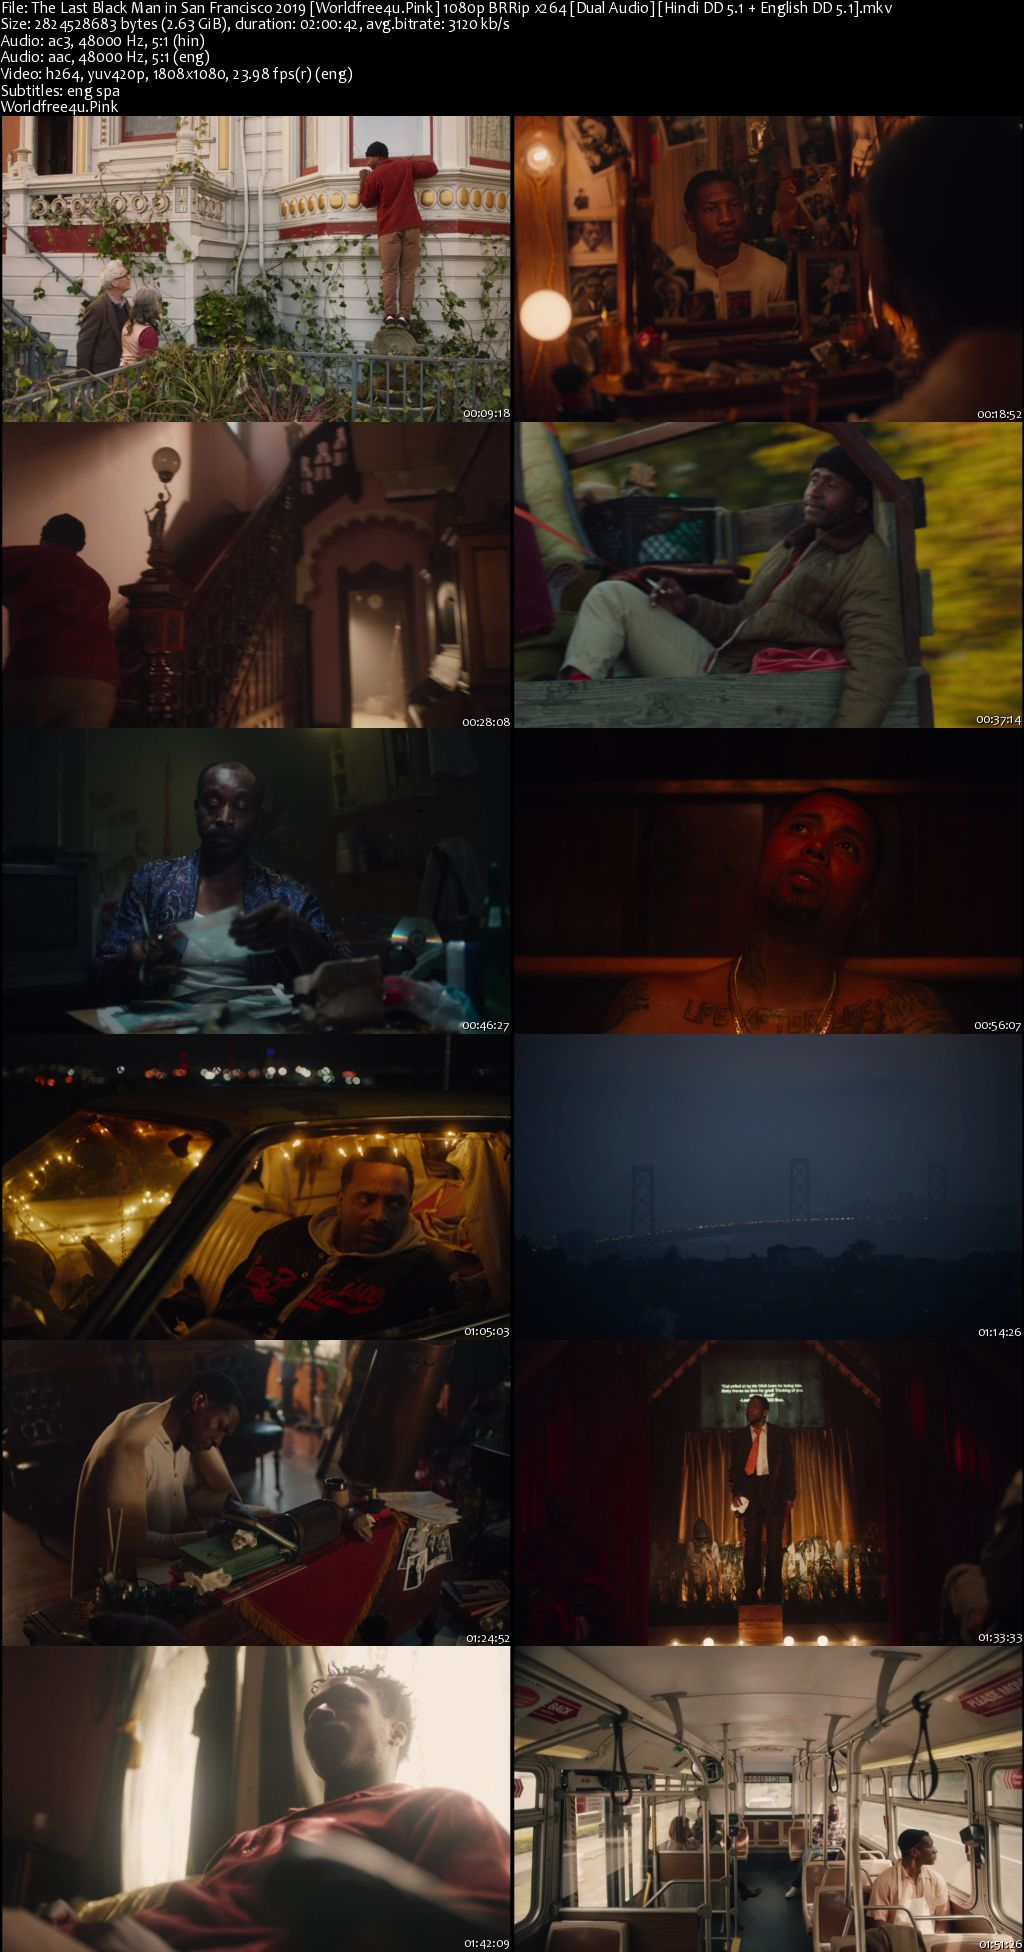 The Last Black Man in San Francisco 2019 BRRip 1080p Dual Audio